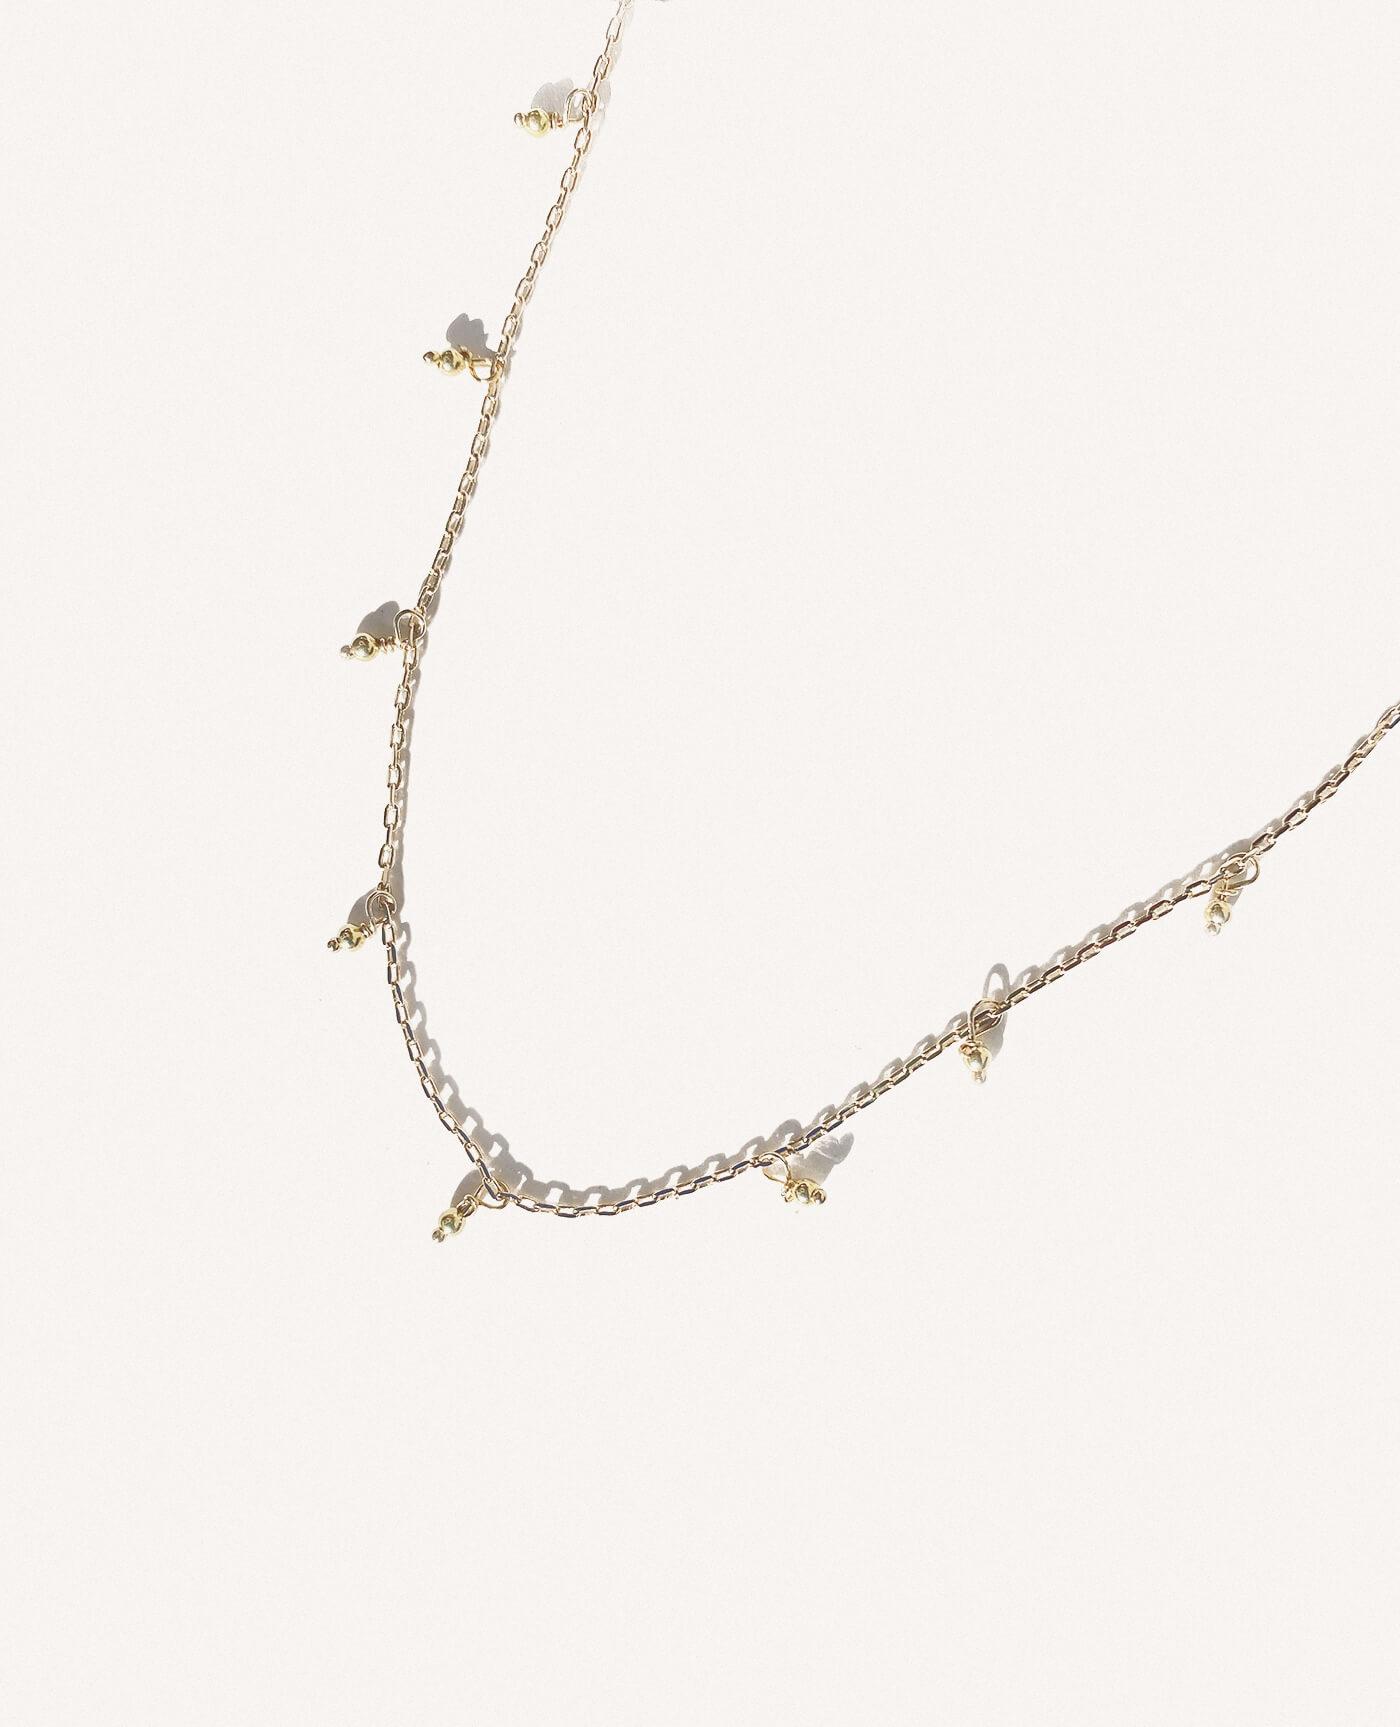 Collier fin Diana en or de la marque Gisel B made in france